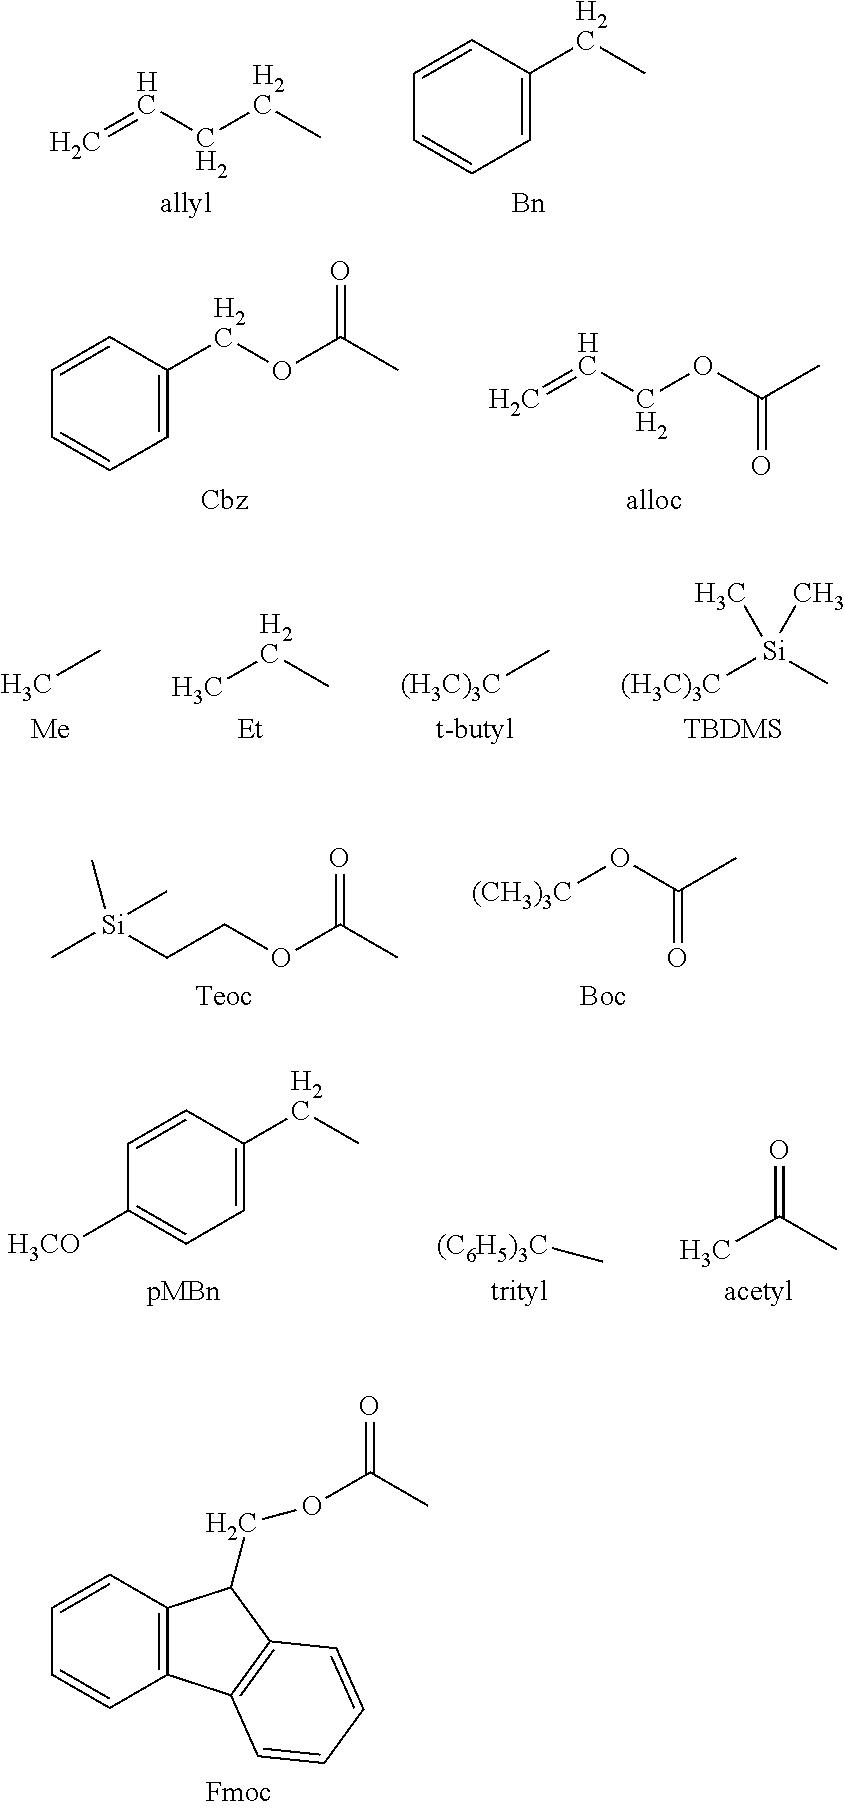 amino acids and peptides with antimetabolic activity ciba foundation symposium